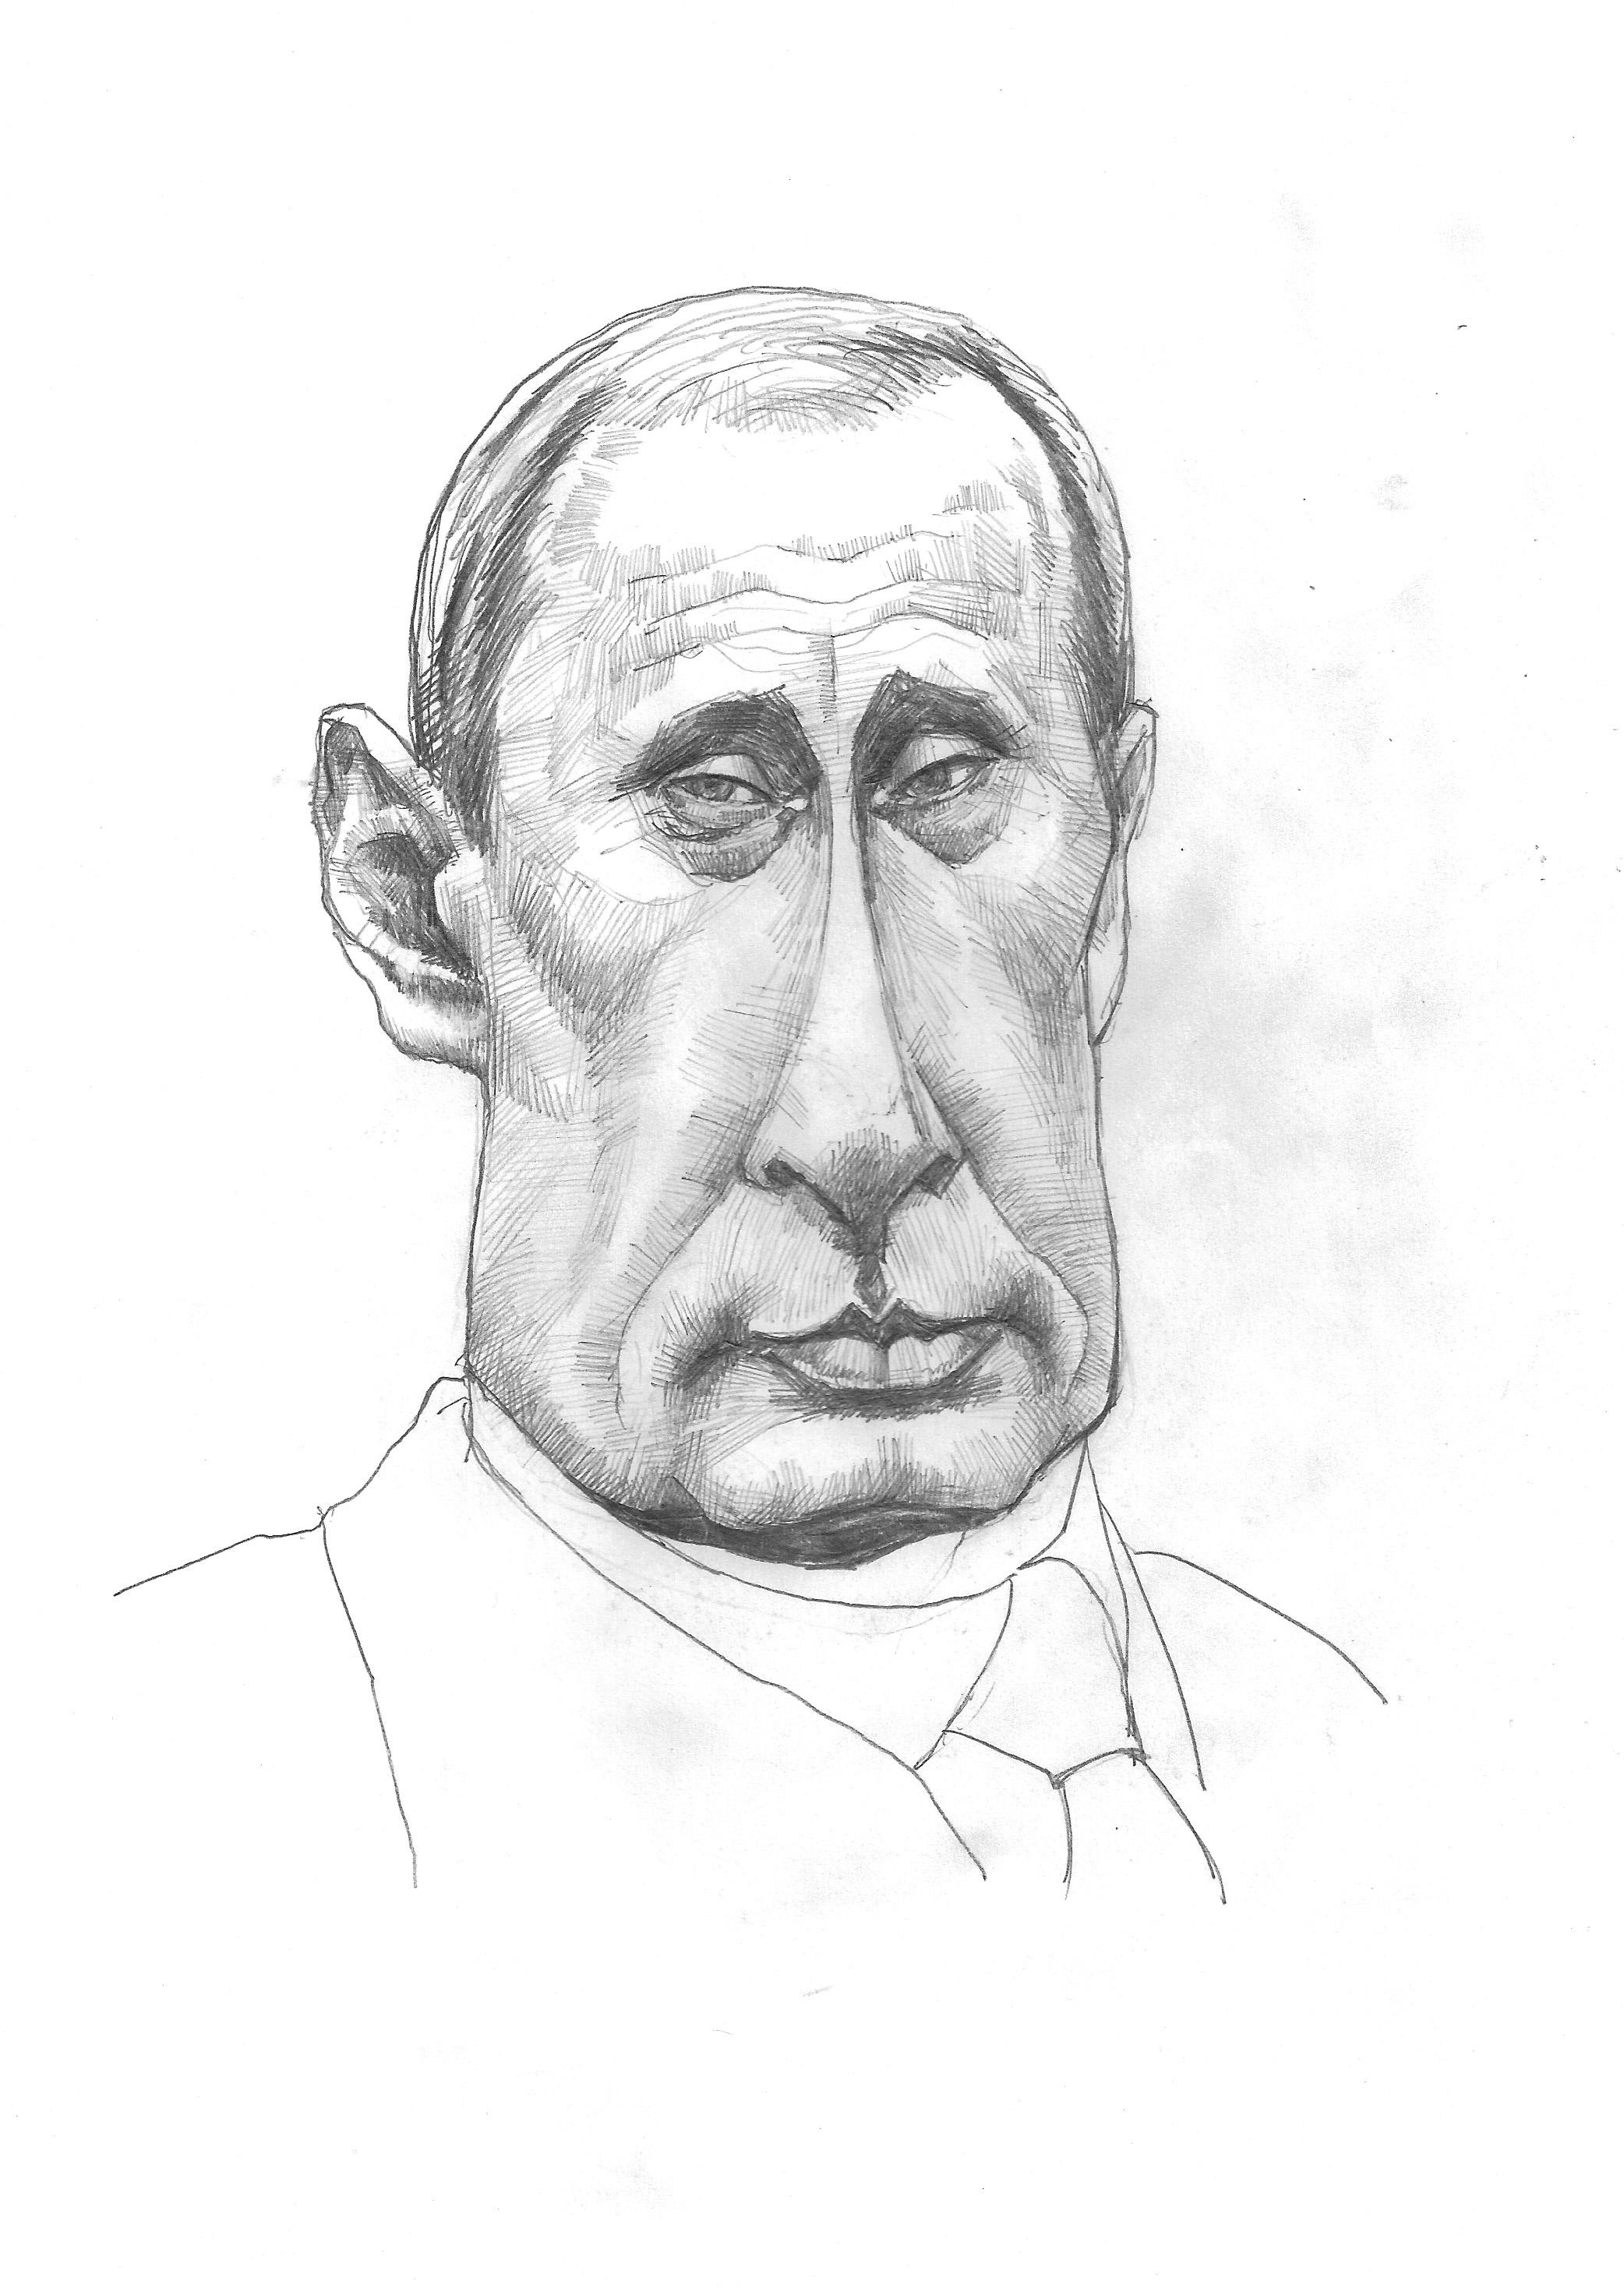 Vladimir Putin sketchbook